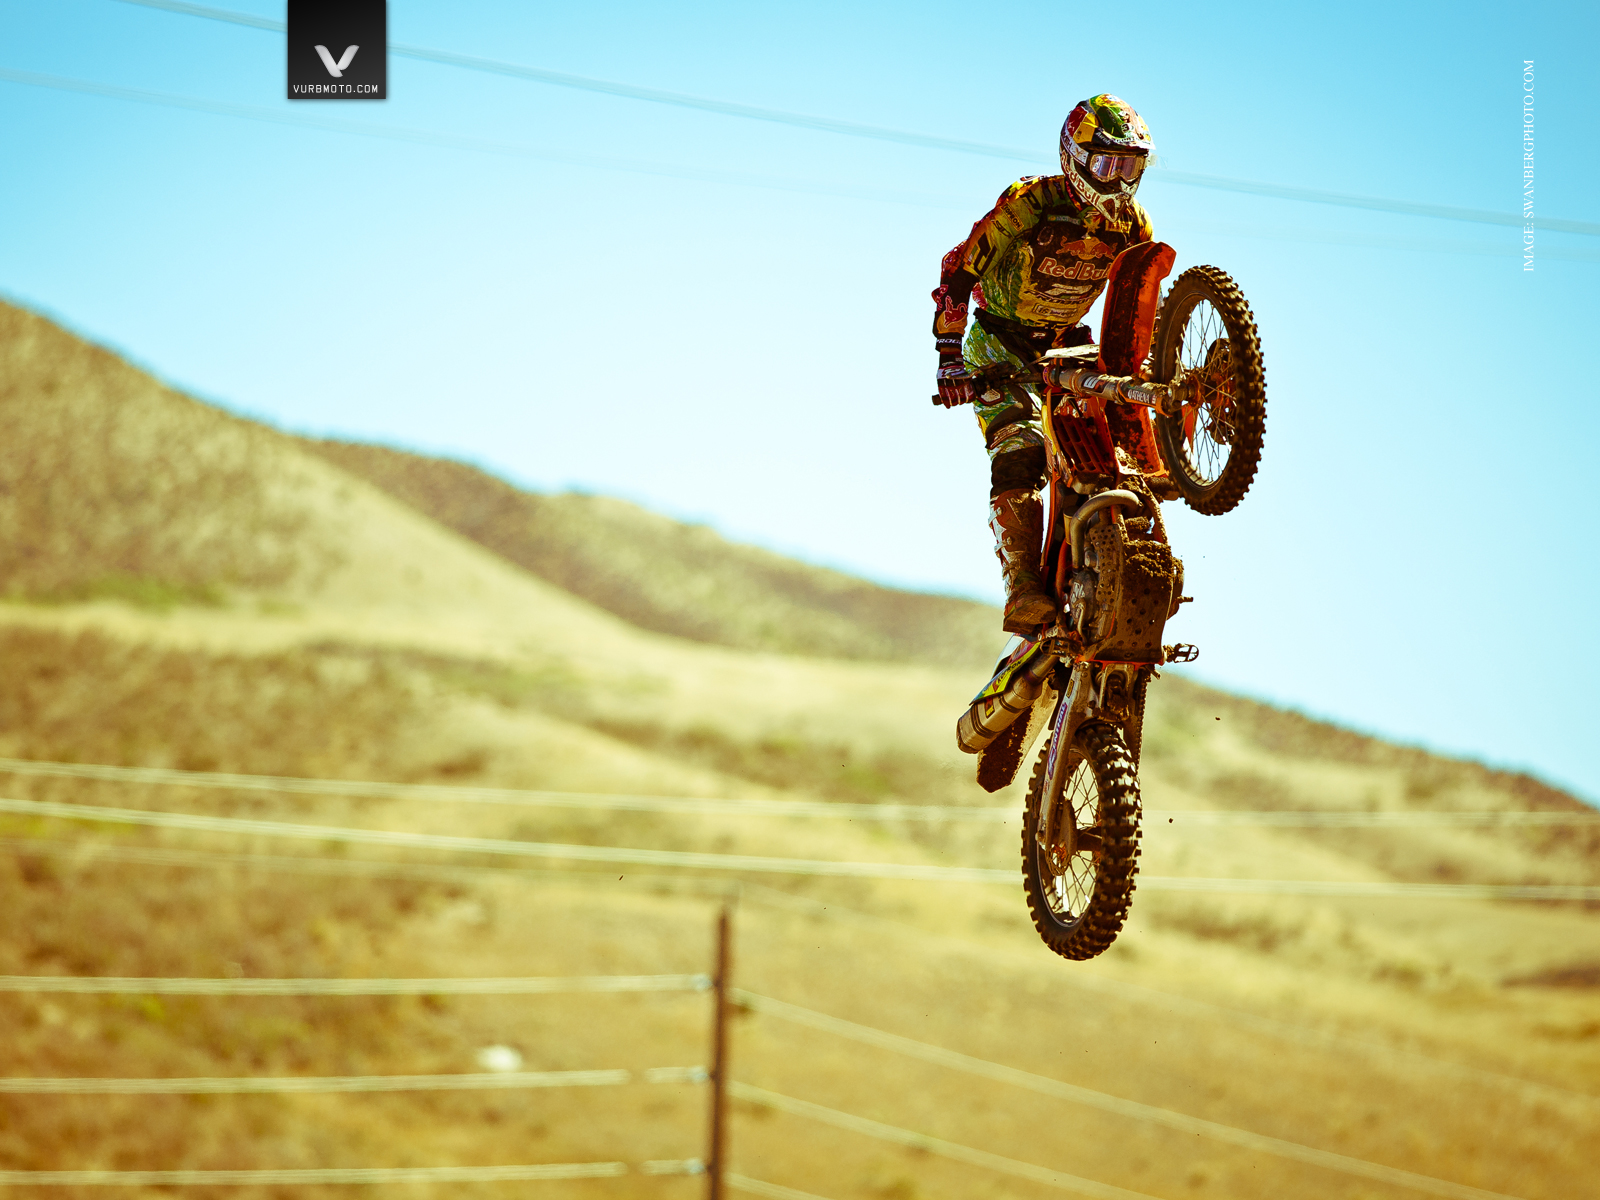 Motocross wallpaper 1600x1200 47795 1600x1200